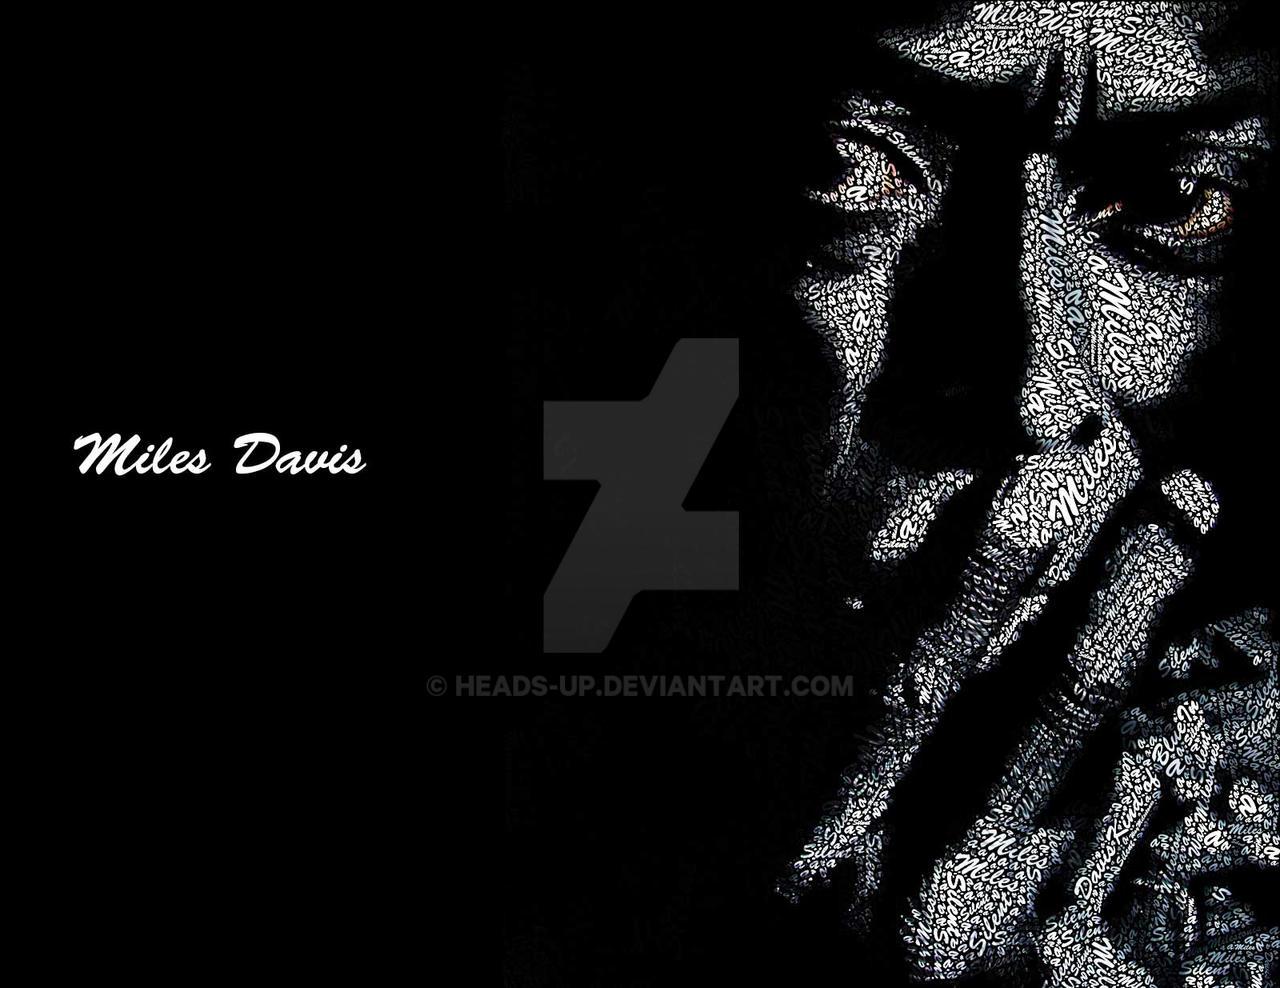 Miles Davis Typo by heads-up